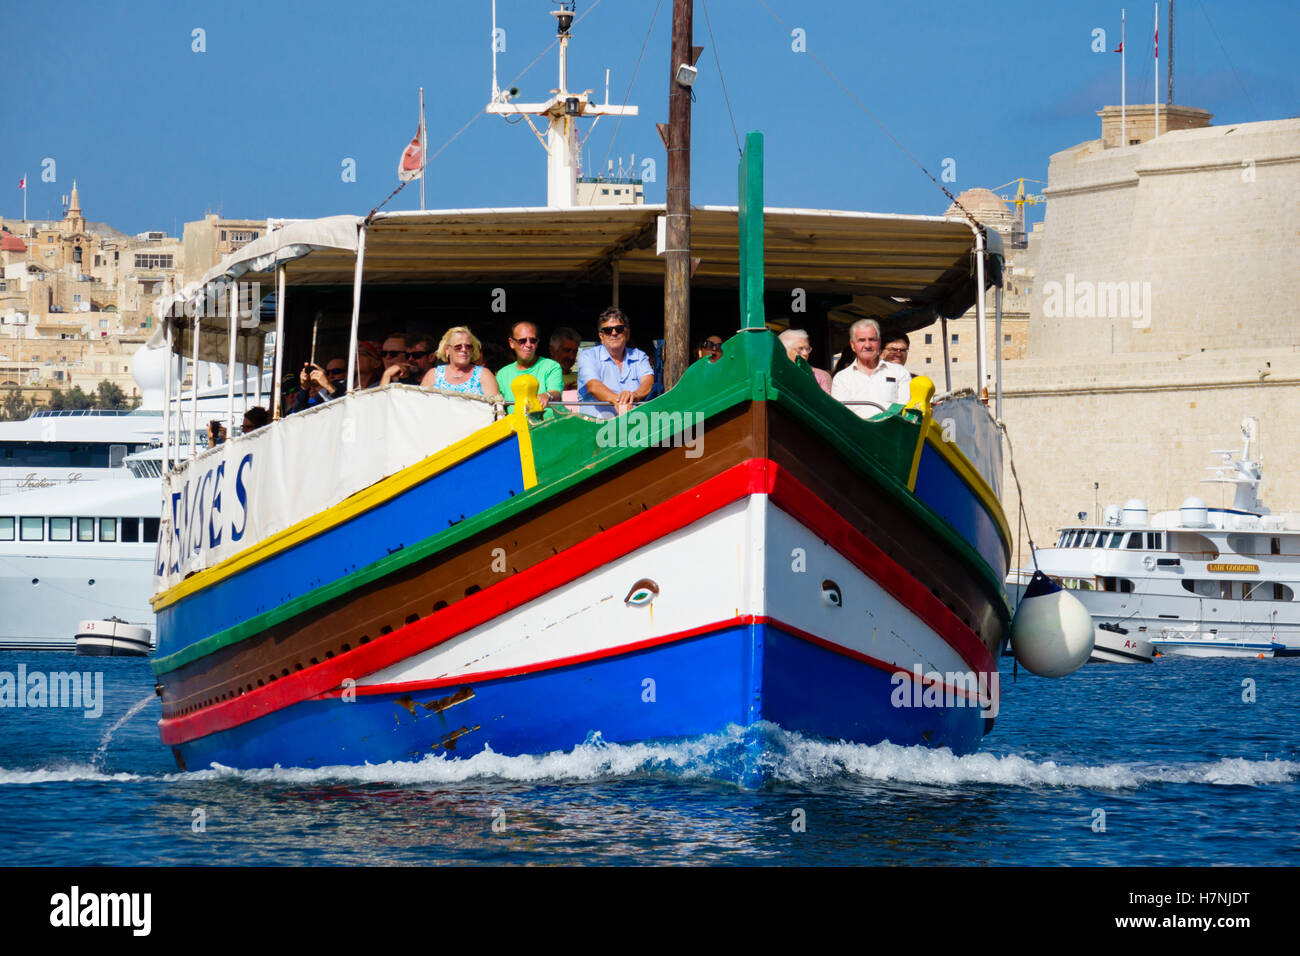 Boat trip in the Grand Harbour of Valletta, Malta. - Stock Image